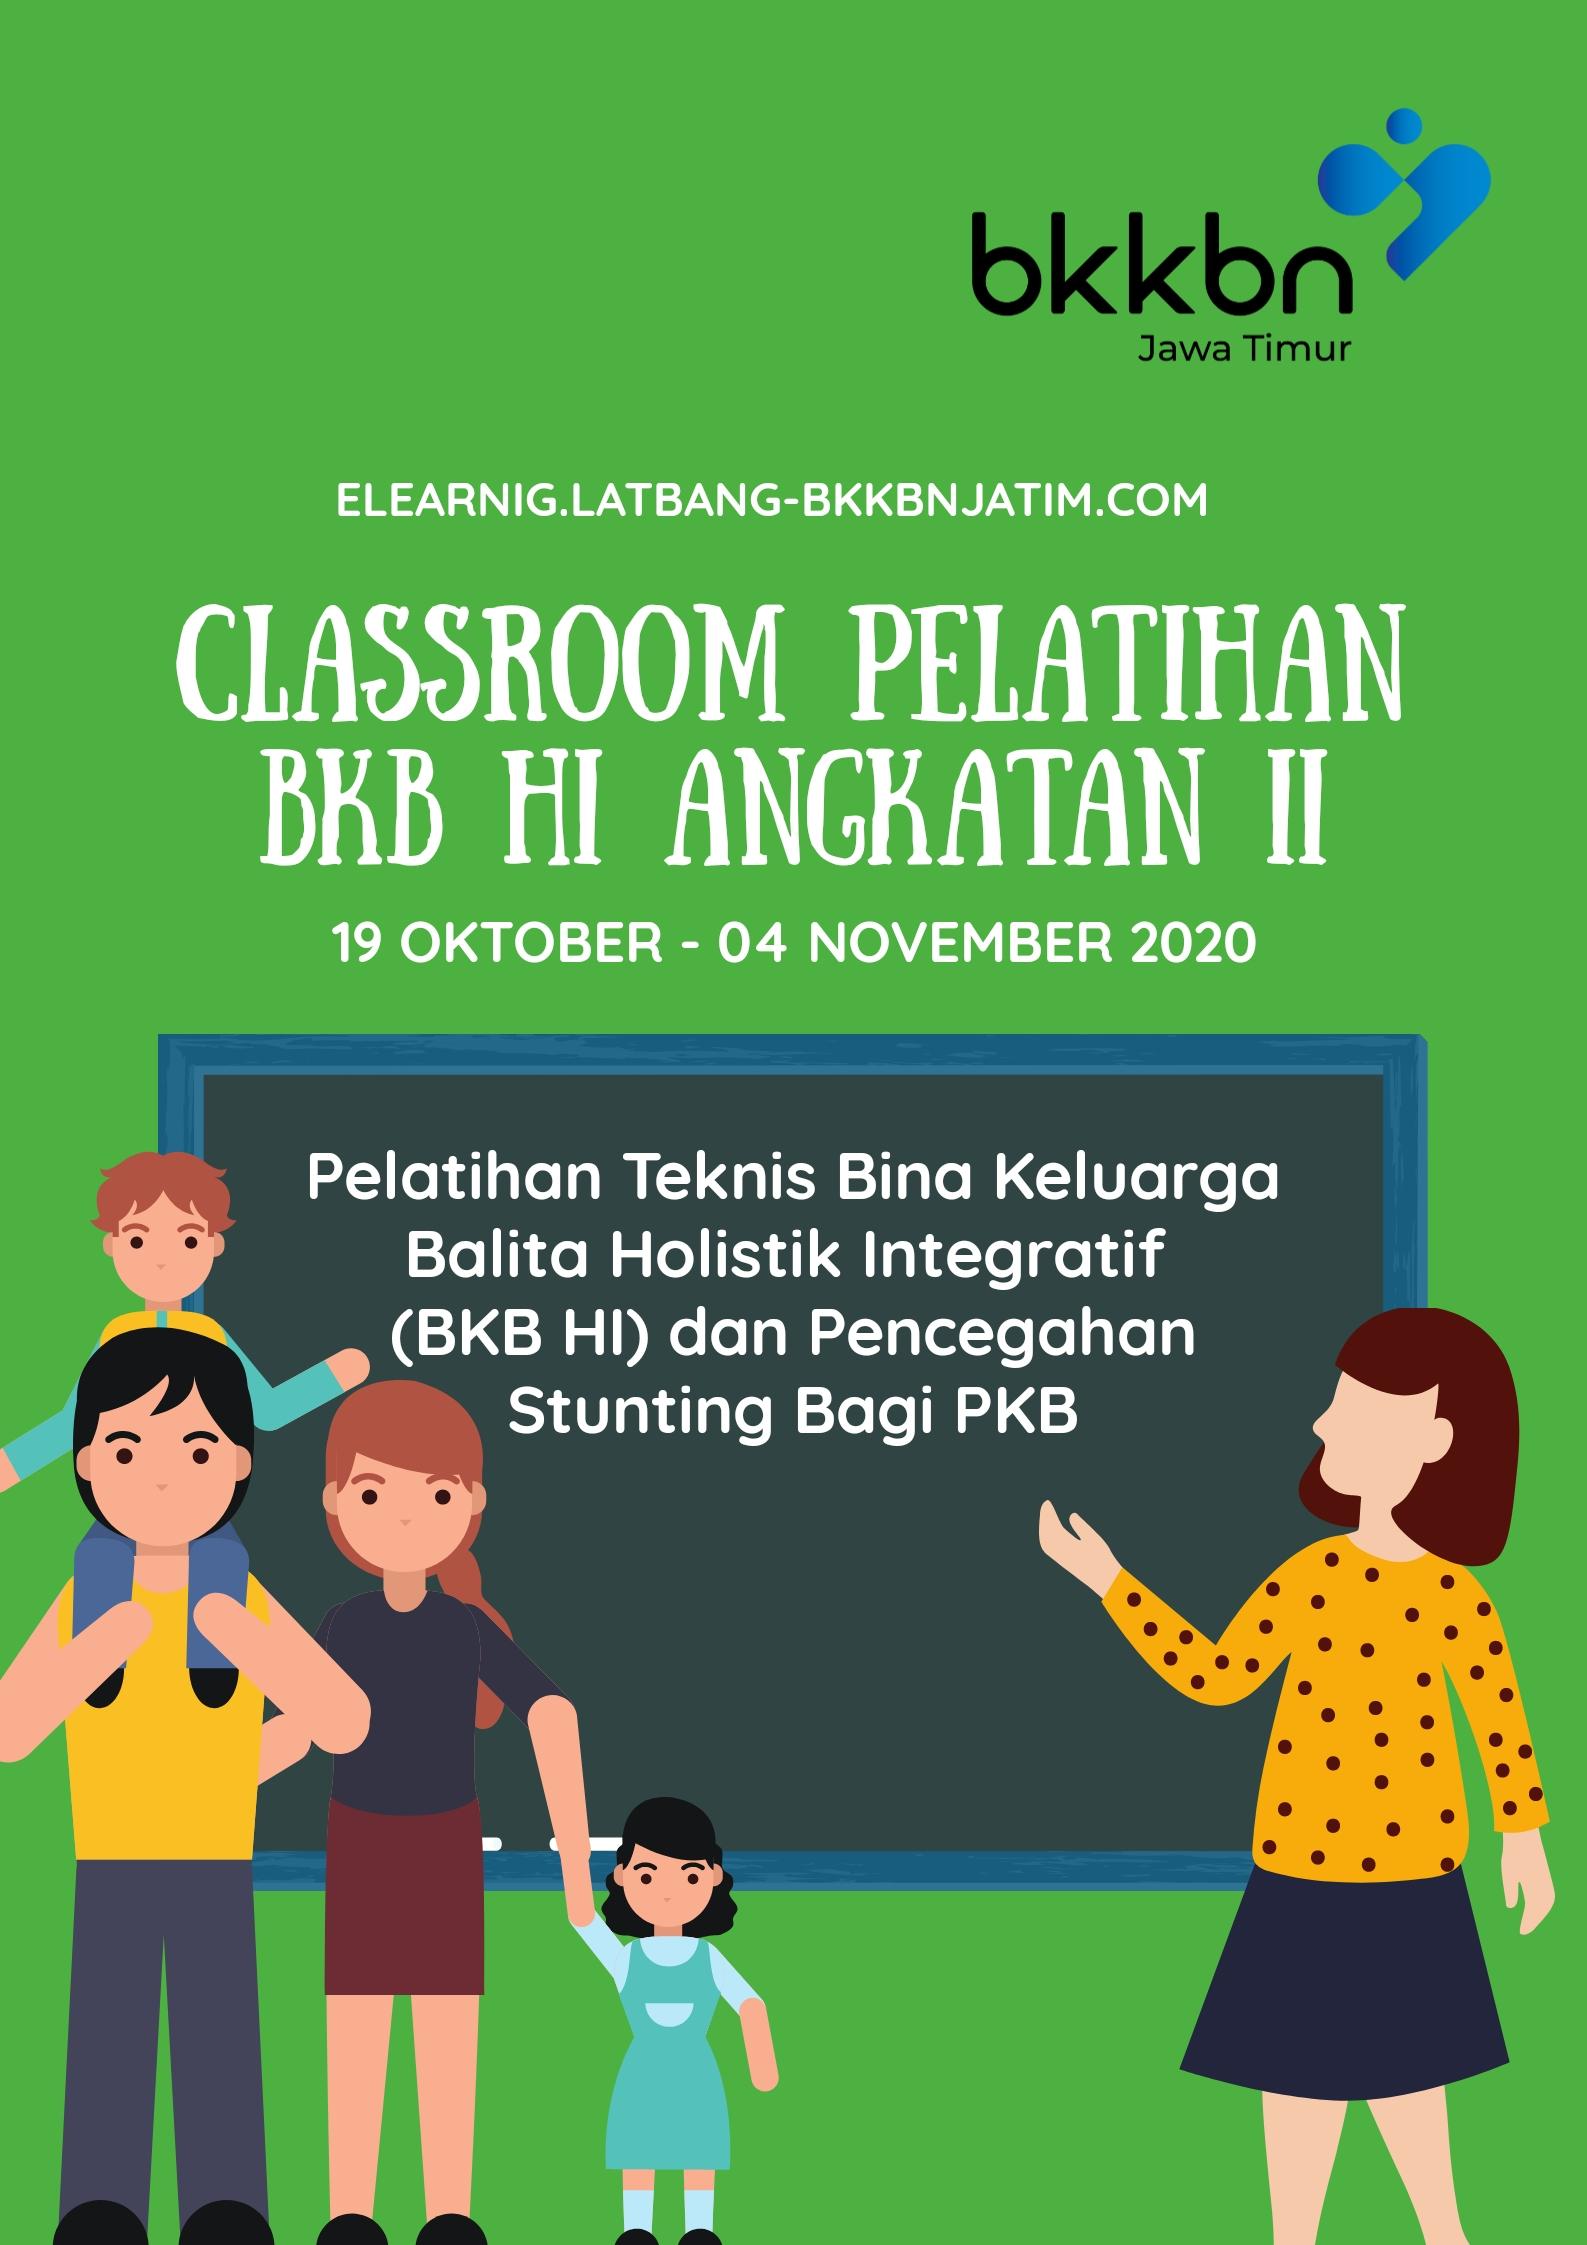 Pelatihan Teknis Bina Keluarga Balita Holistik Integratif (BKB HI) dan Pencegahan Stunting bagi PKB Melalui E-Learning Angkatan II